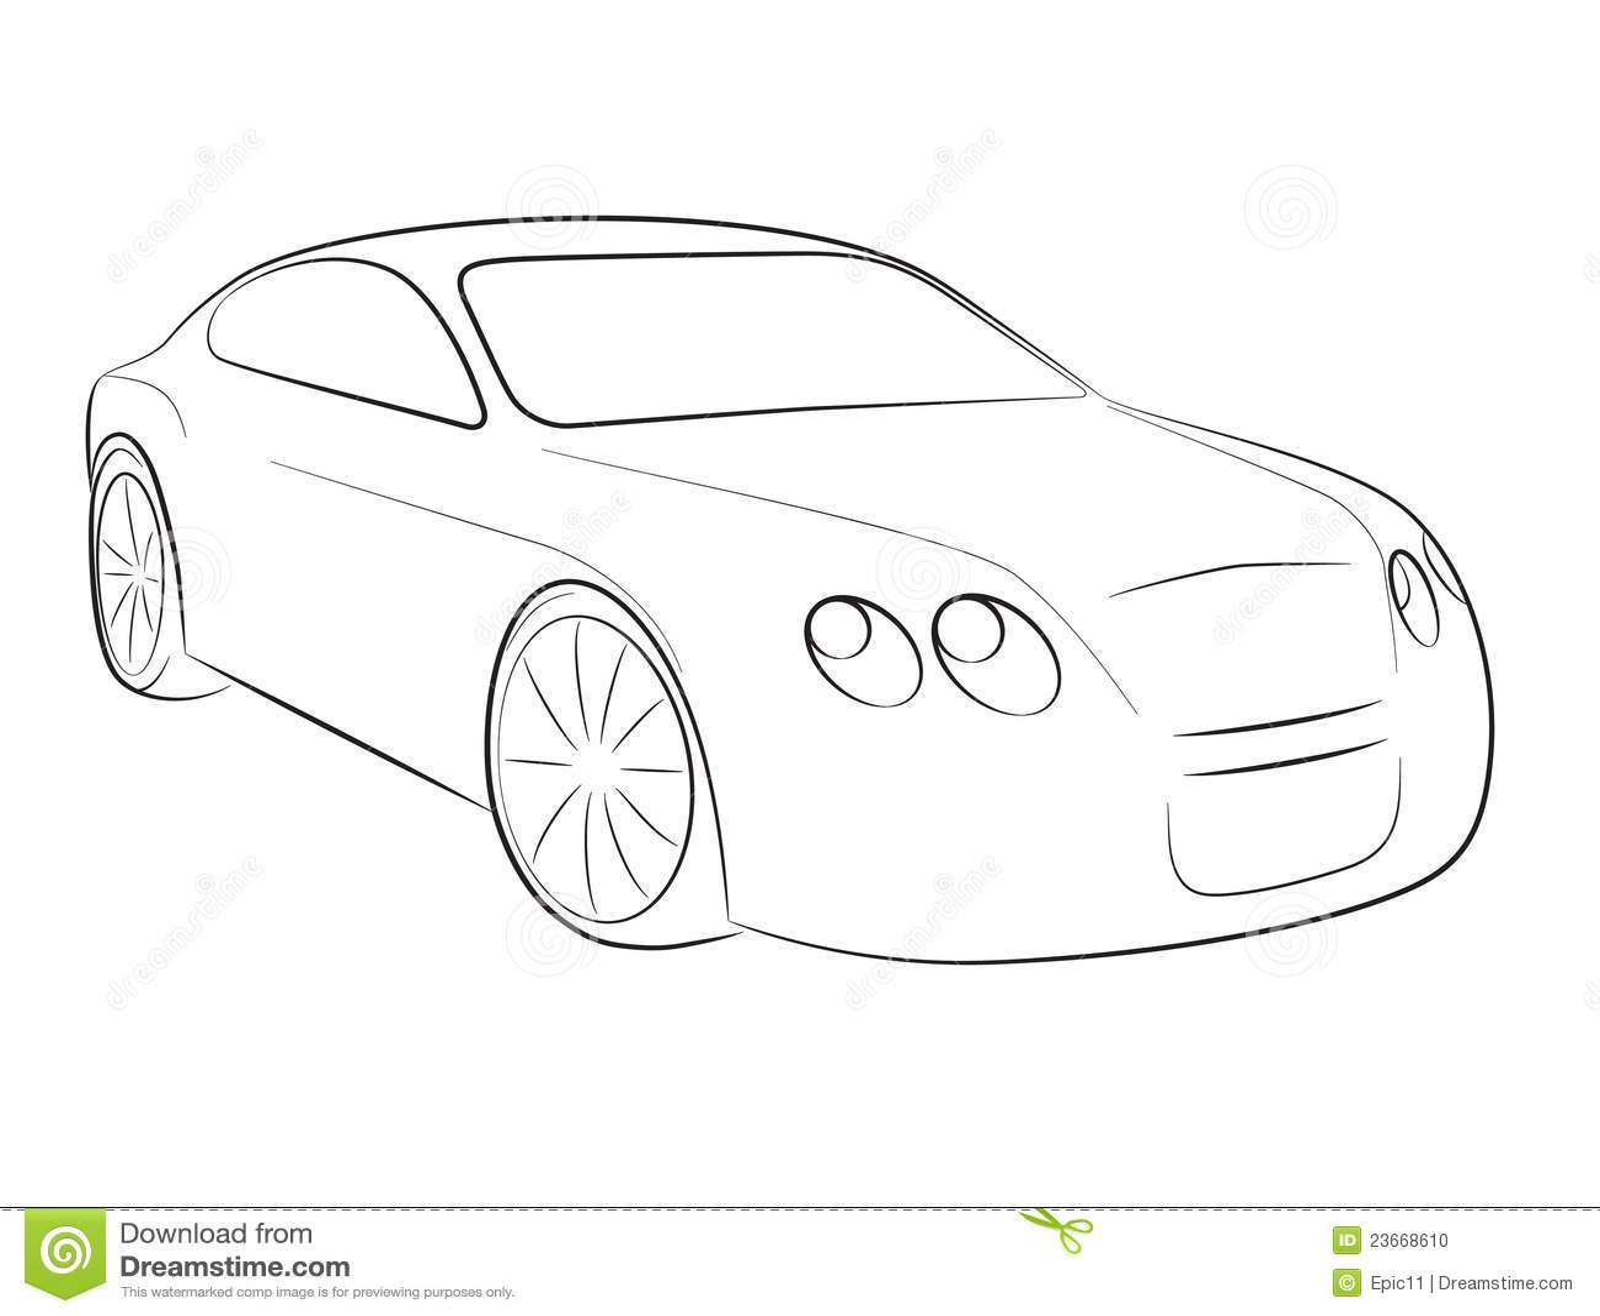 Cartoon Silhouette Of A Car Stock Photo Image 23668610